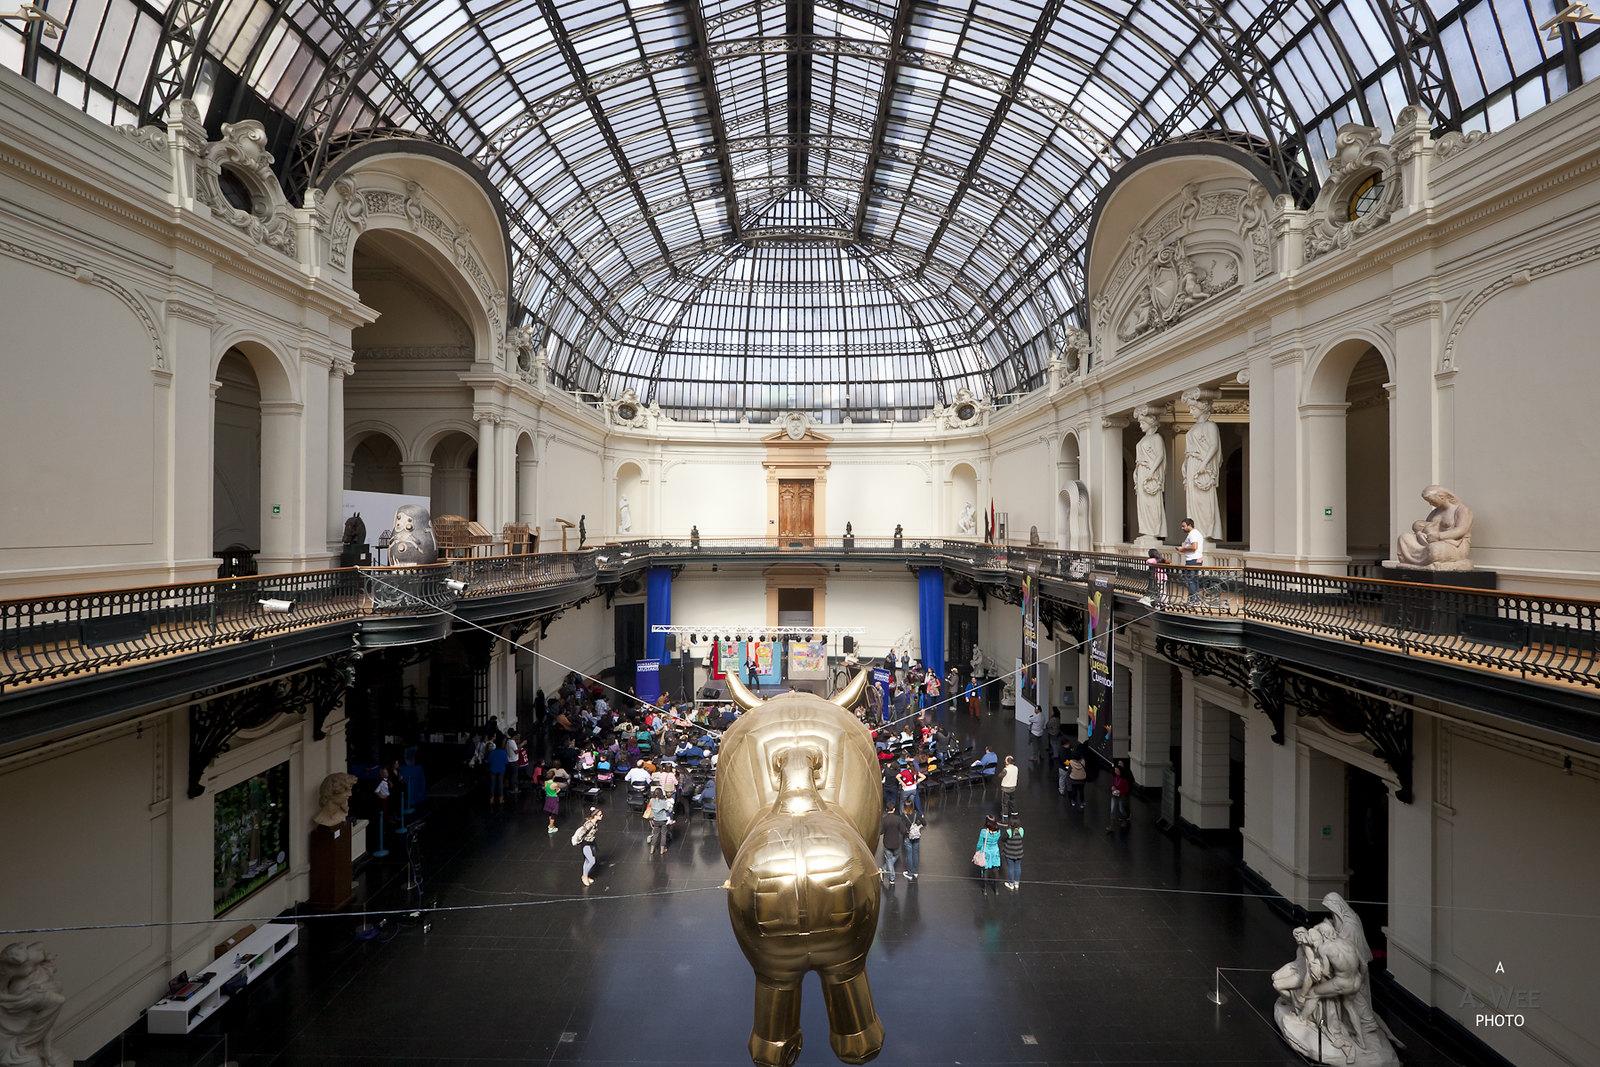 Under the glass-domed atrium